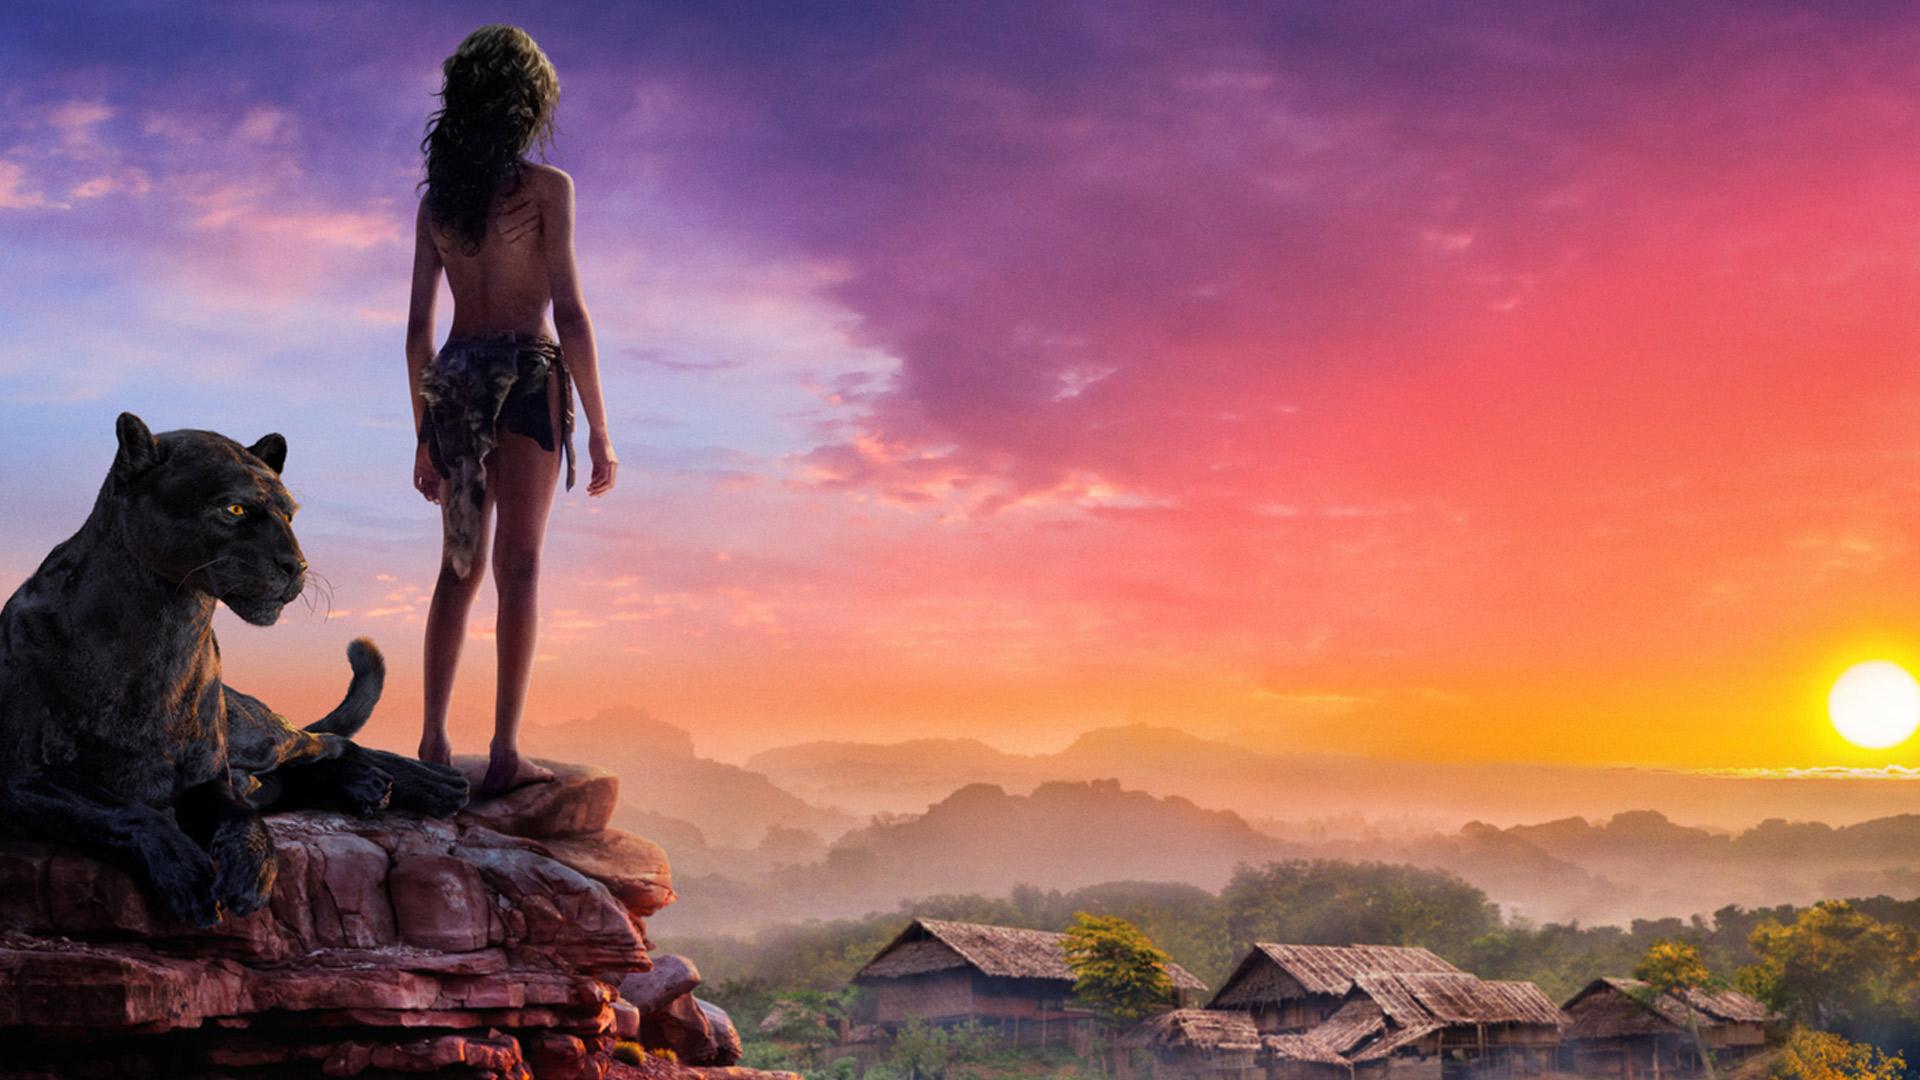 Mowgli Legend of the Jungle 2018 VOD Reviews Popzara Press 1920x1080